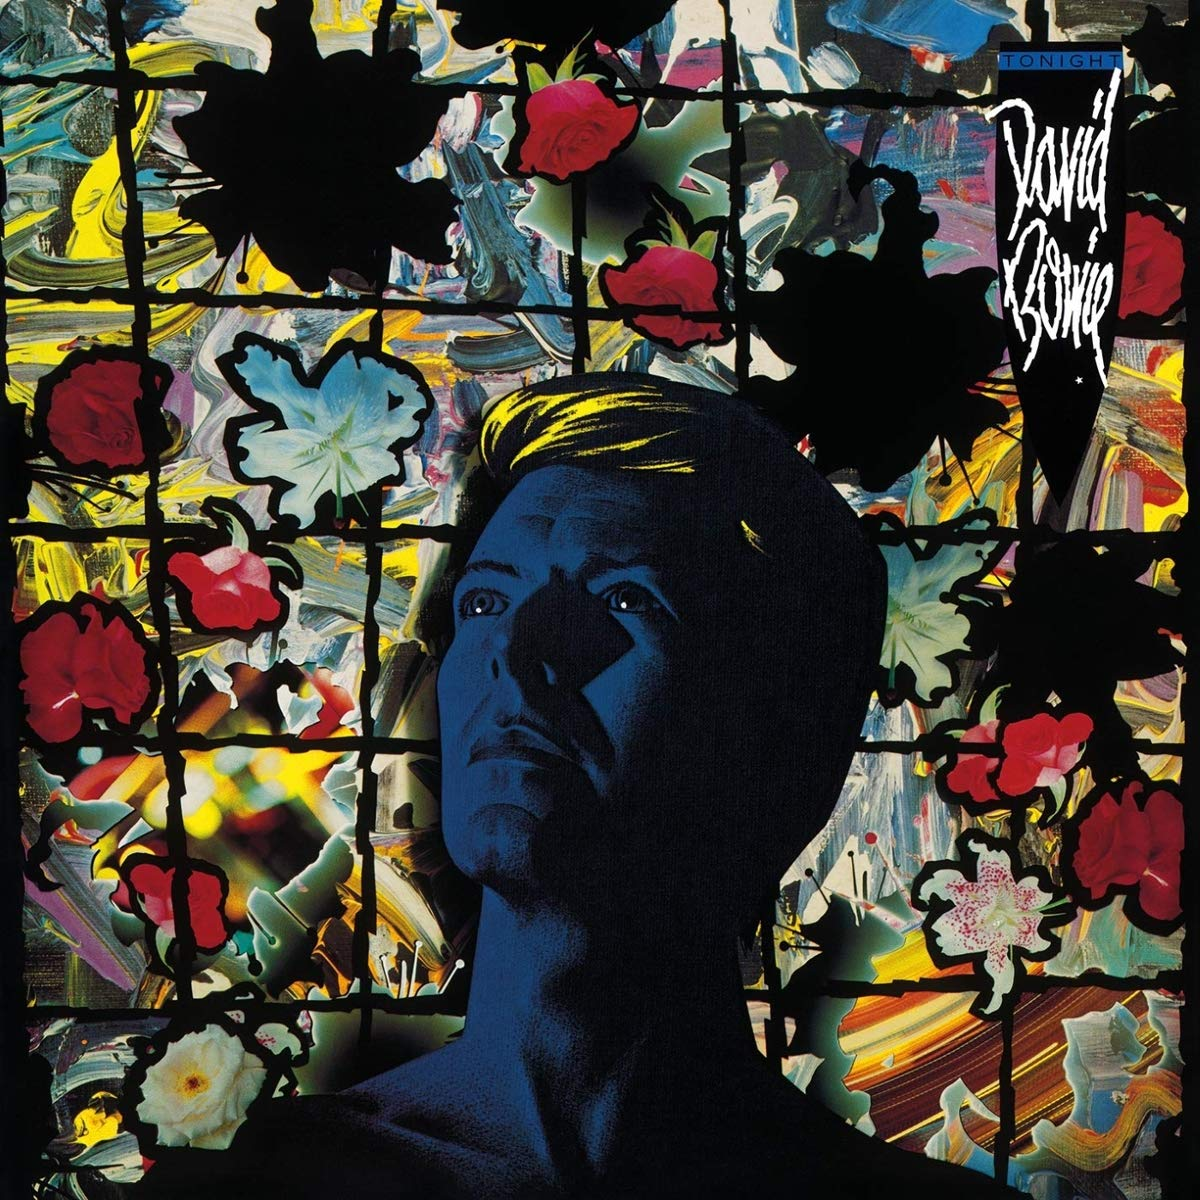 Copertina Vinile 33 giri Tonight di David Bowie